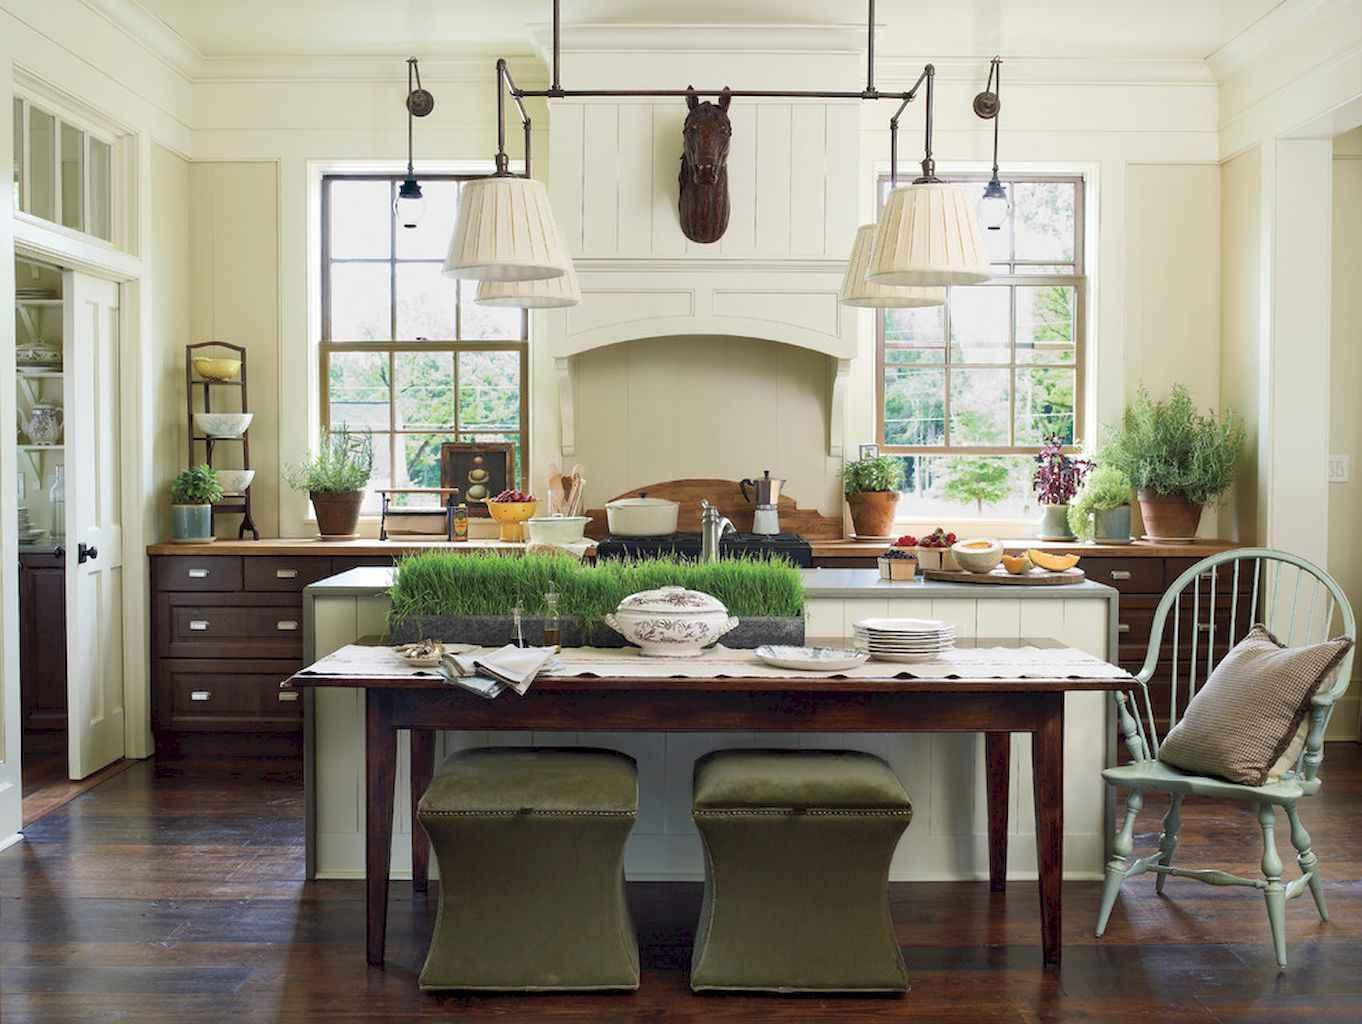 100 Rustic Farmhouse Dining Room Decor Ideas (51)